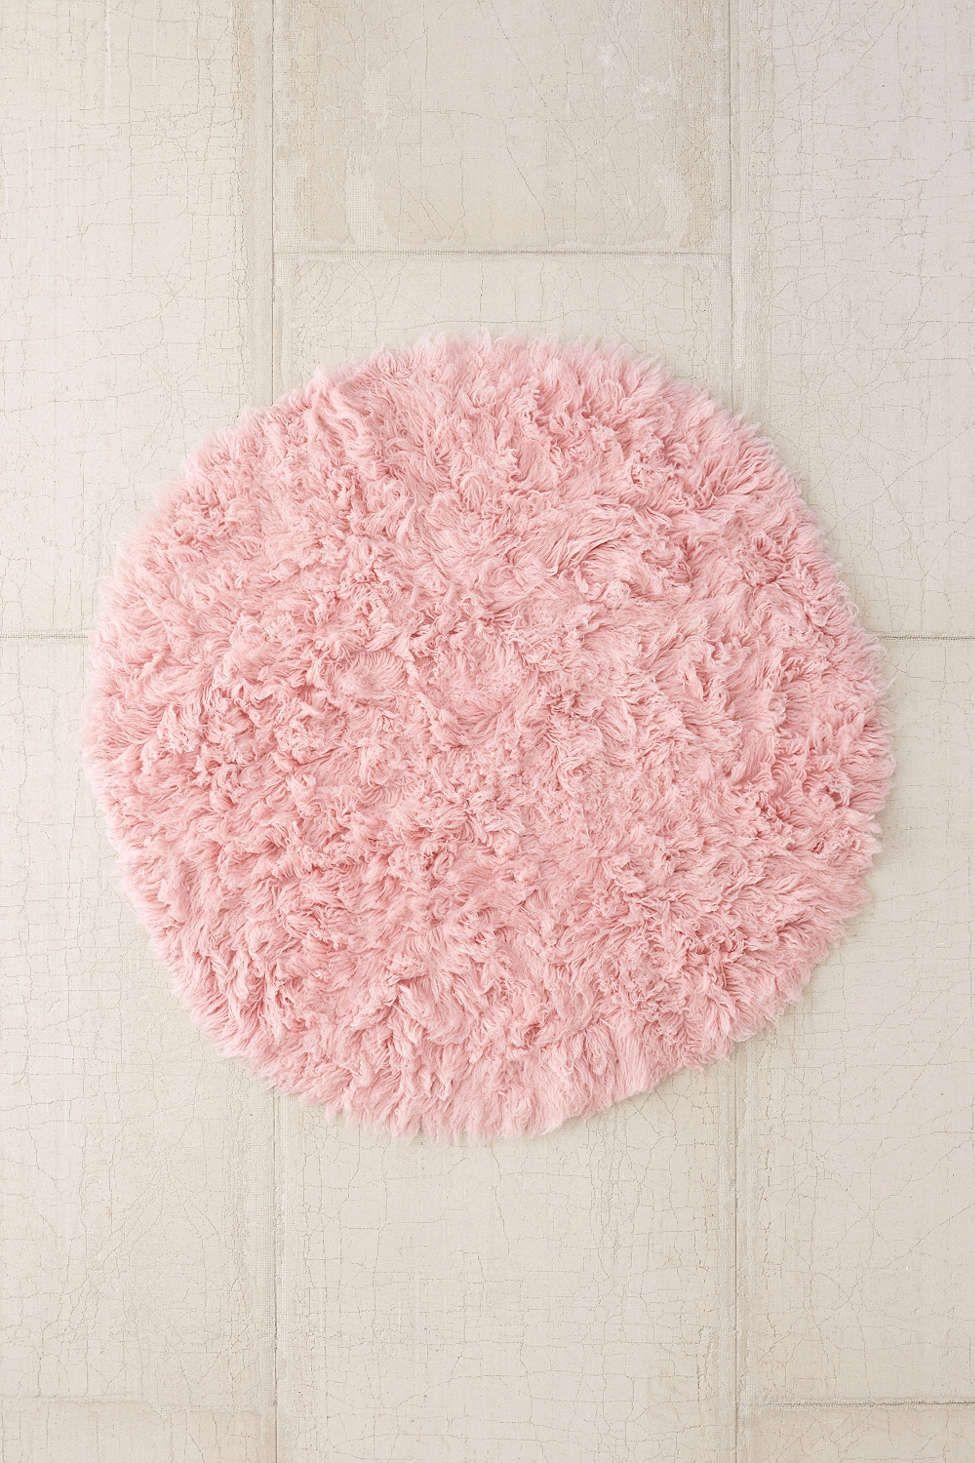 Flokati Shag Rug Shag Rugs Pink Rug And Dorm